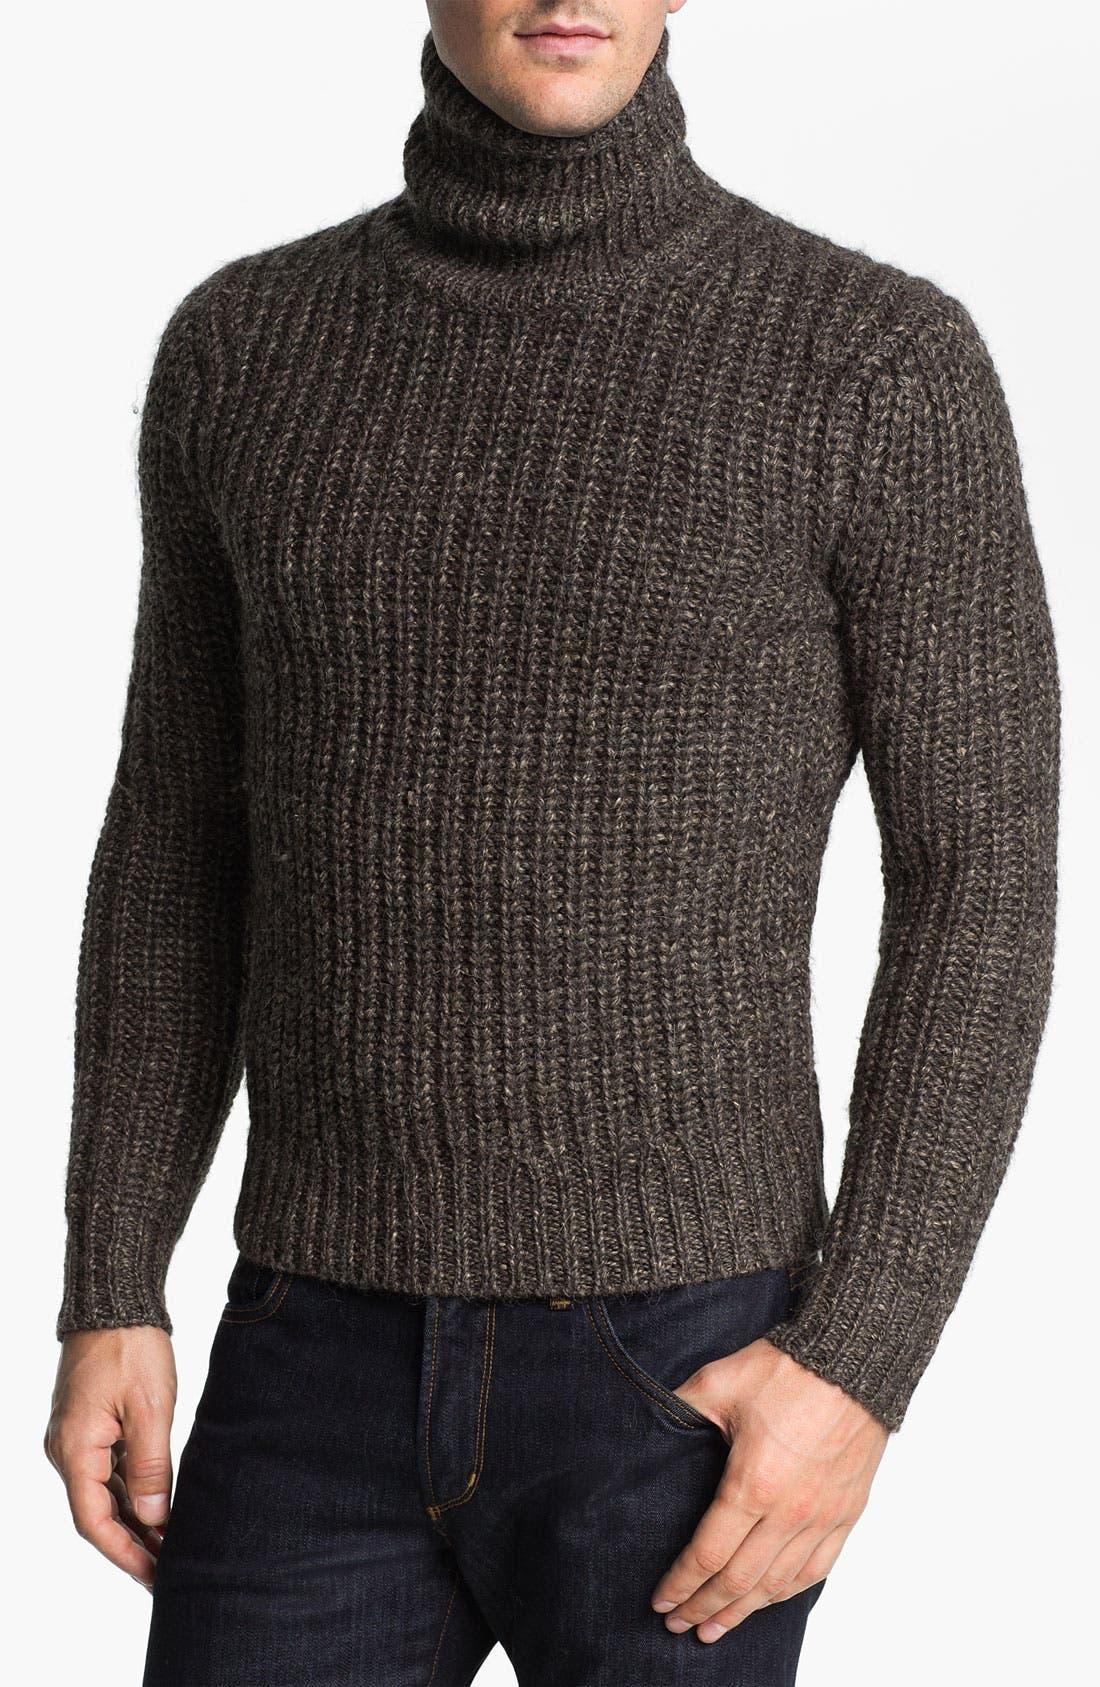 MICHAEL KORS Alpaca Blend Turtleneck Sweater, Main, color, 029